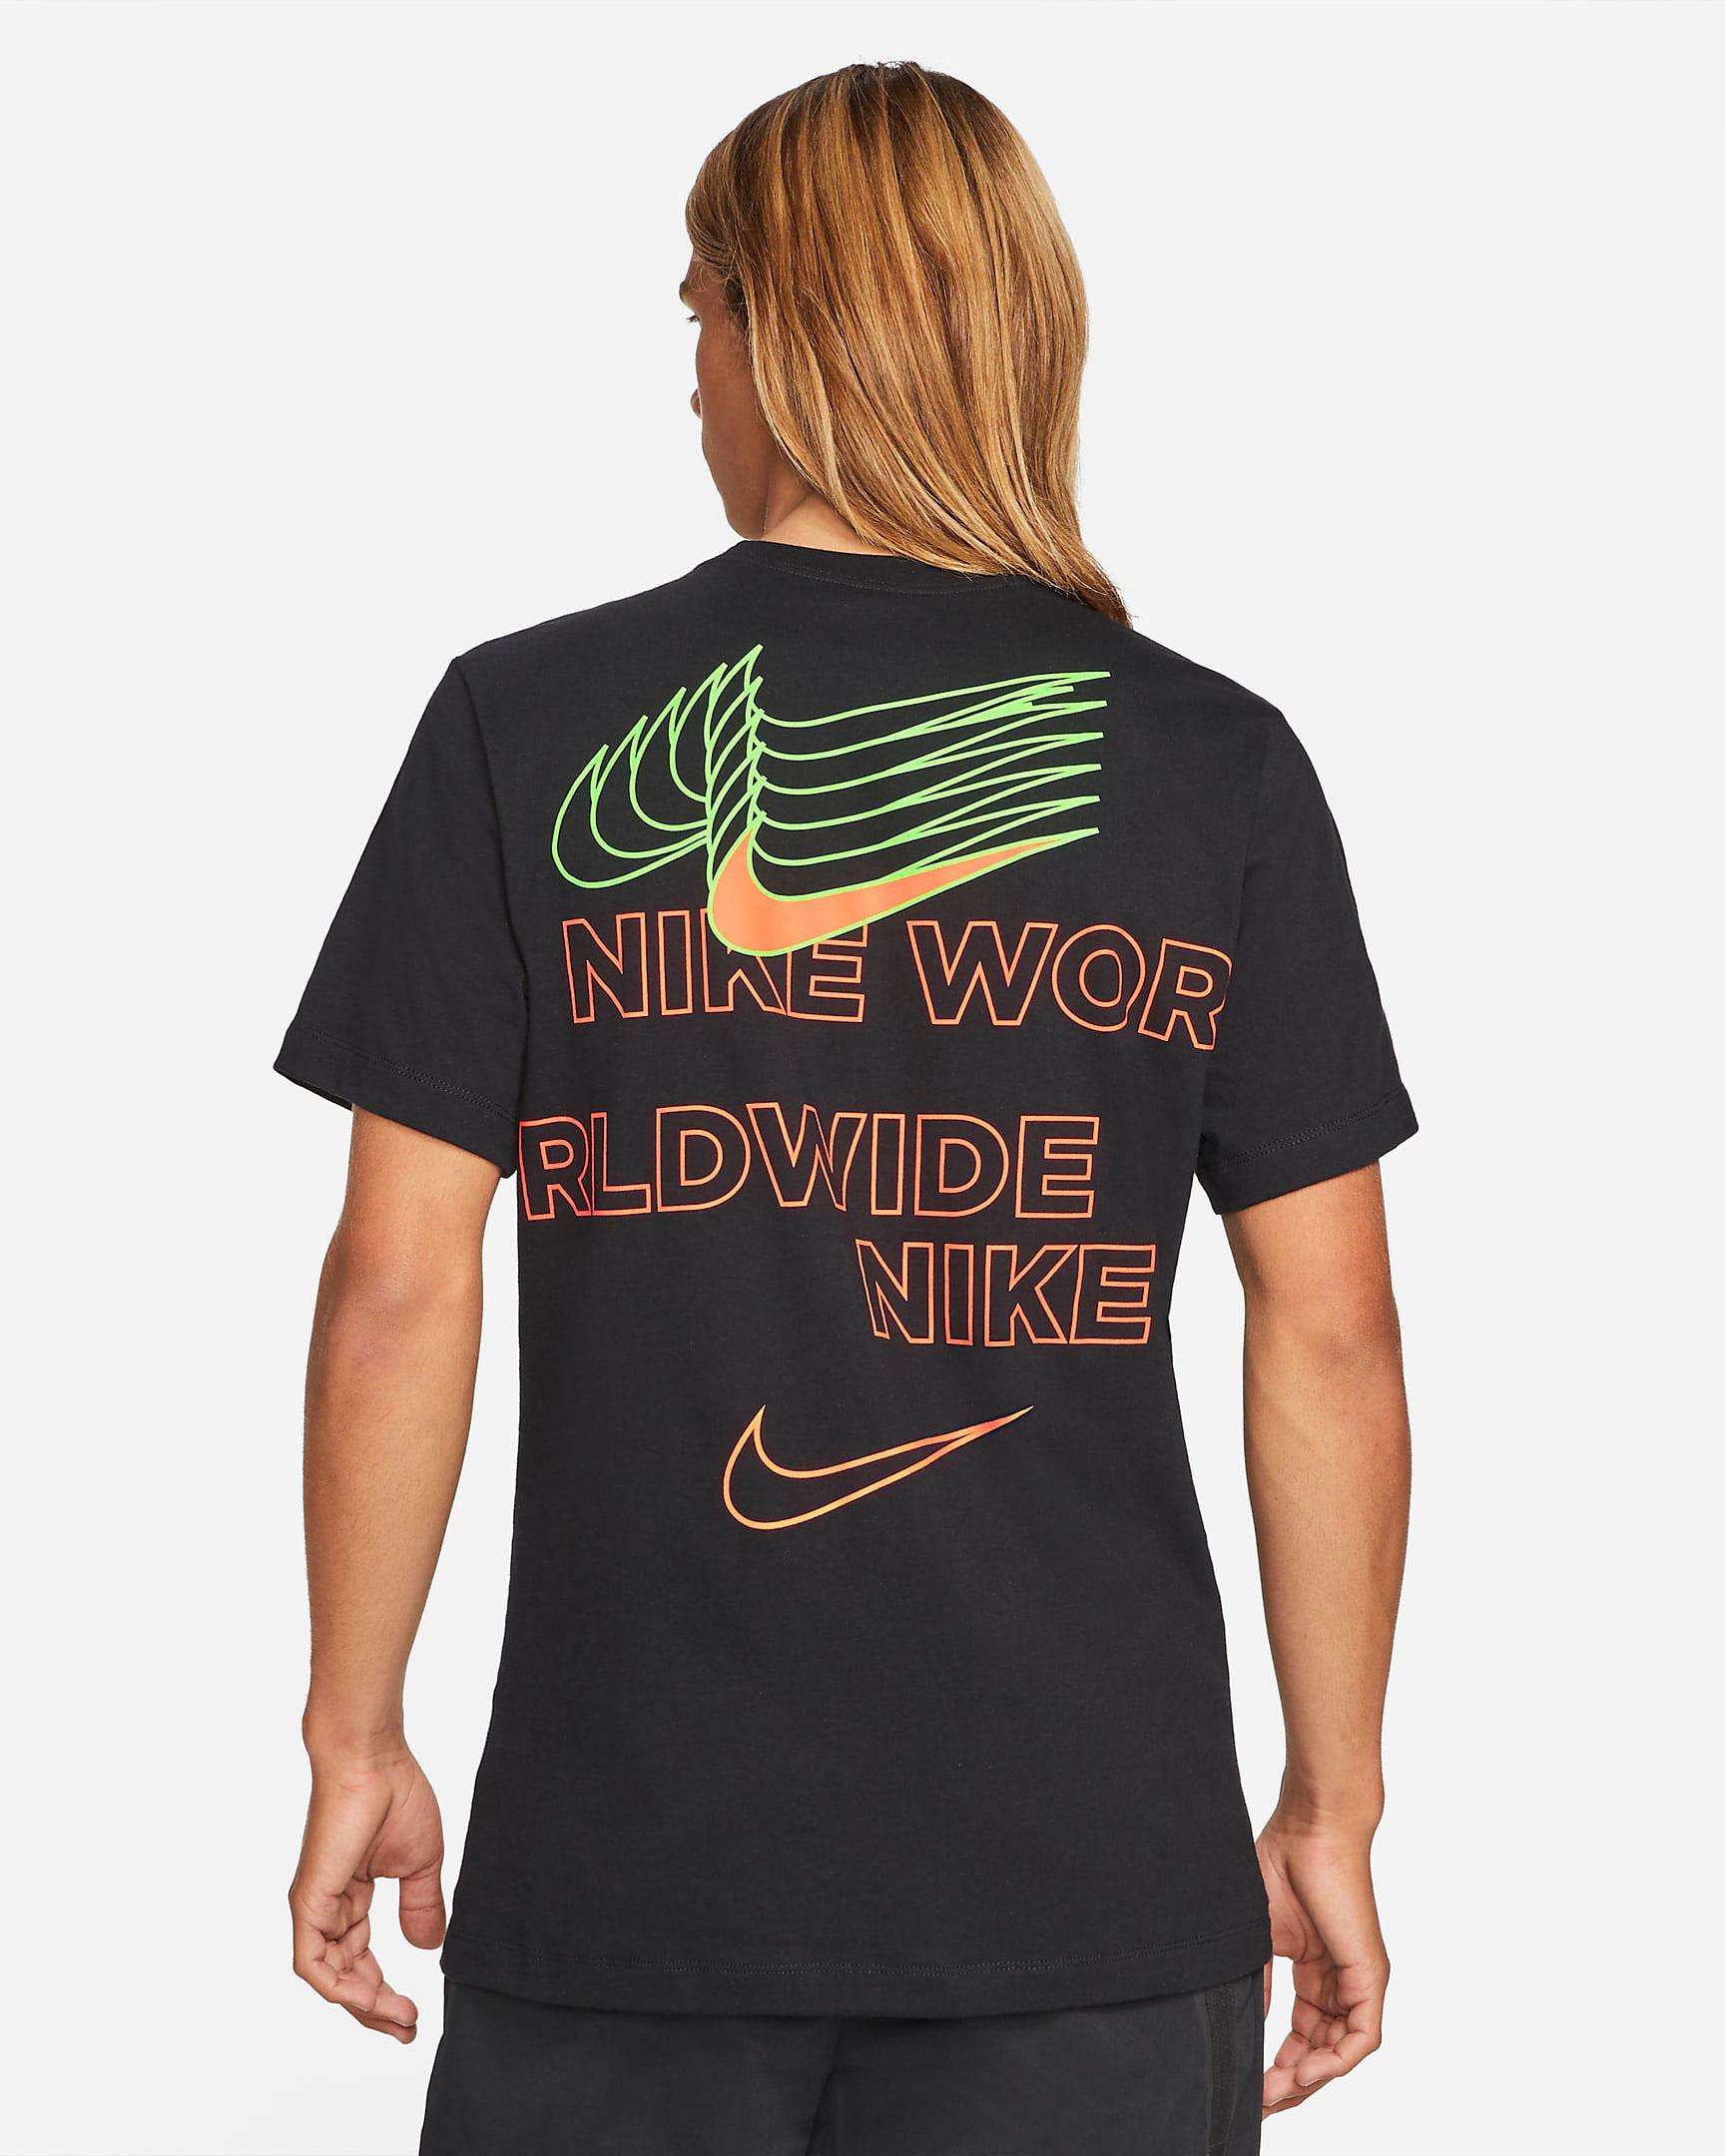 nike-worldwide-shirt-2